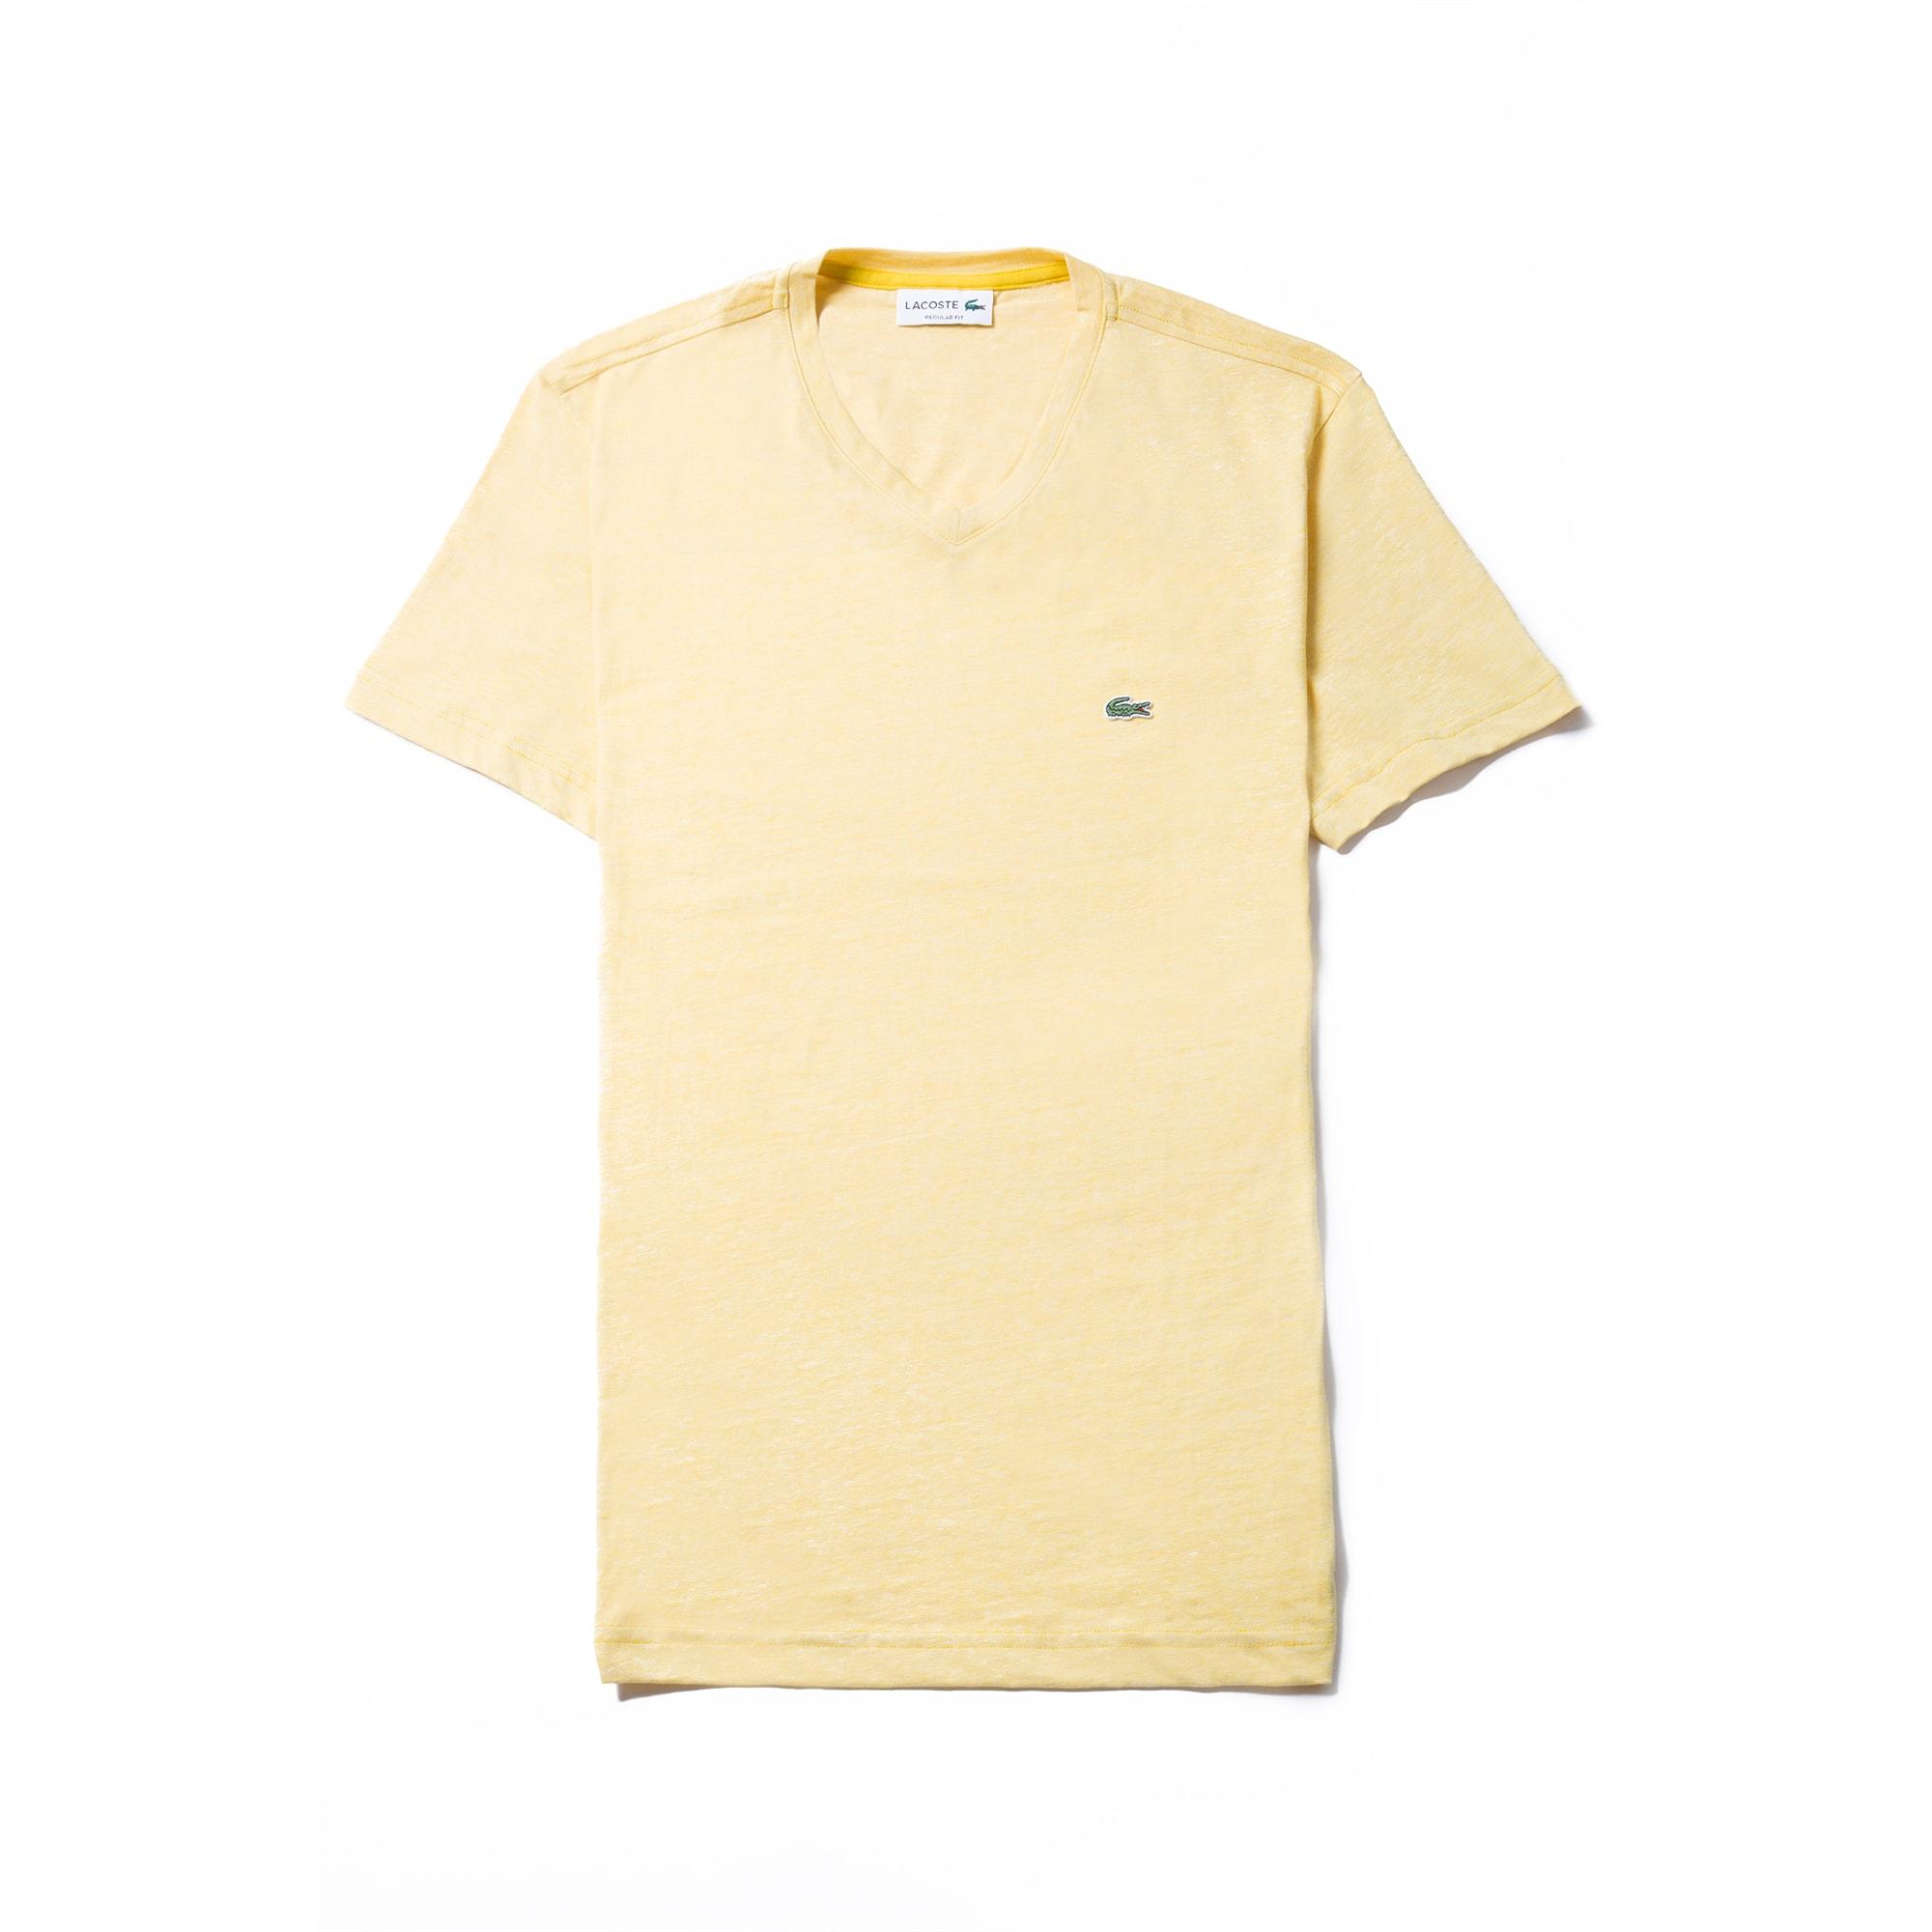 Men's V-neck Thin Striped Cotton Jersey T-shirt